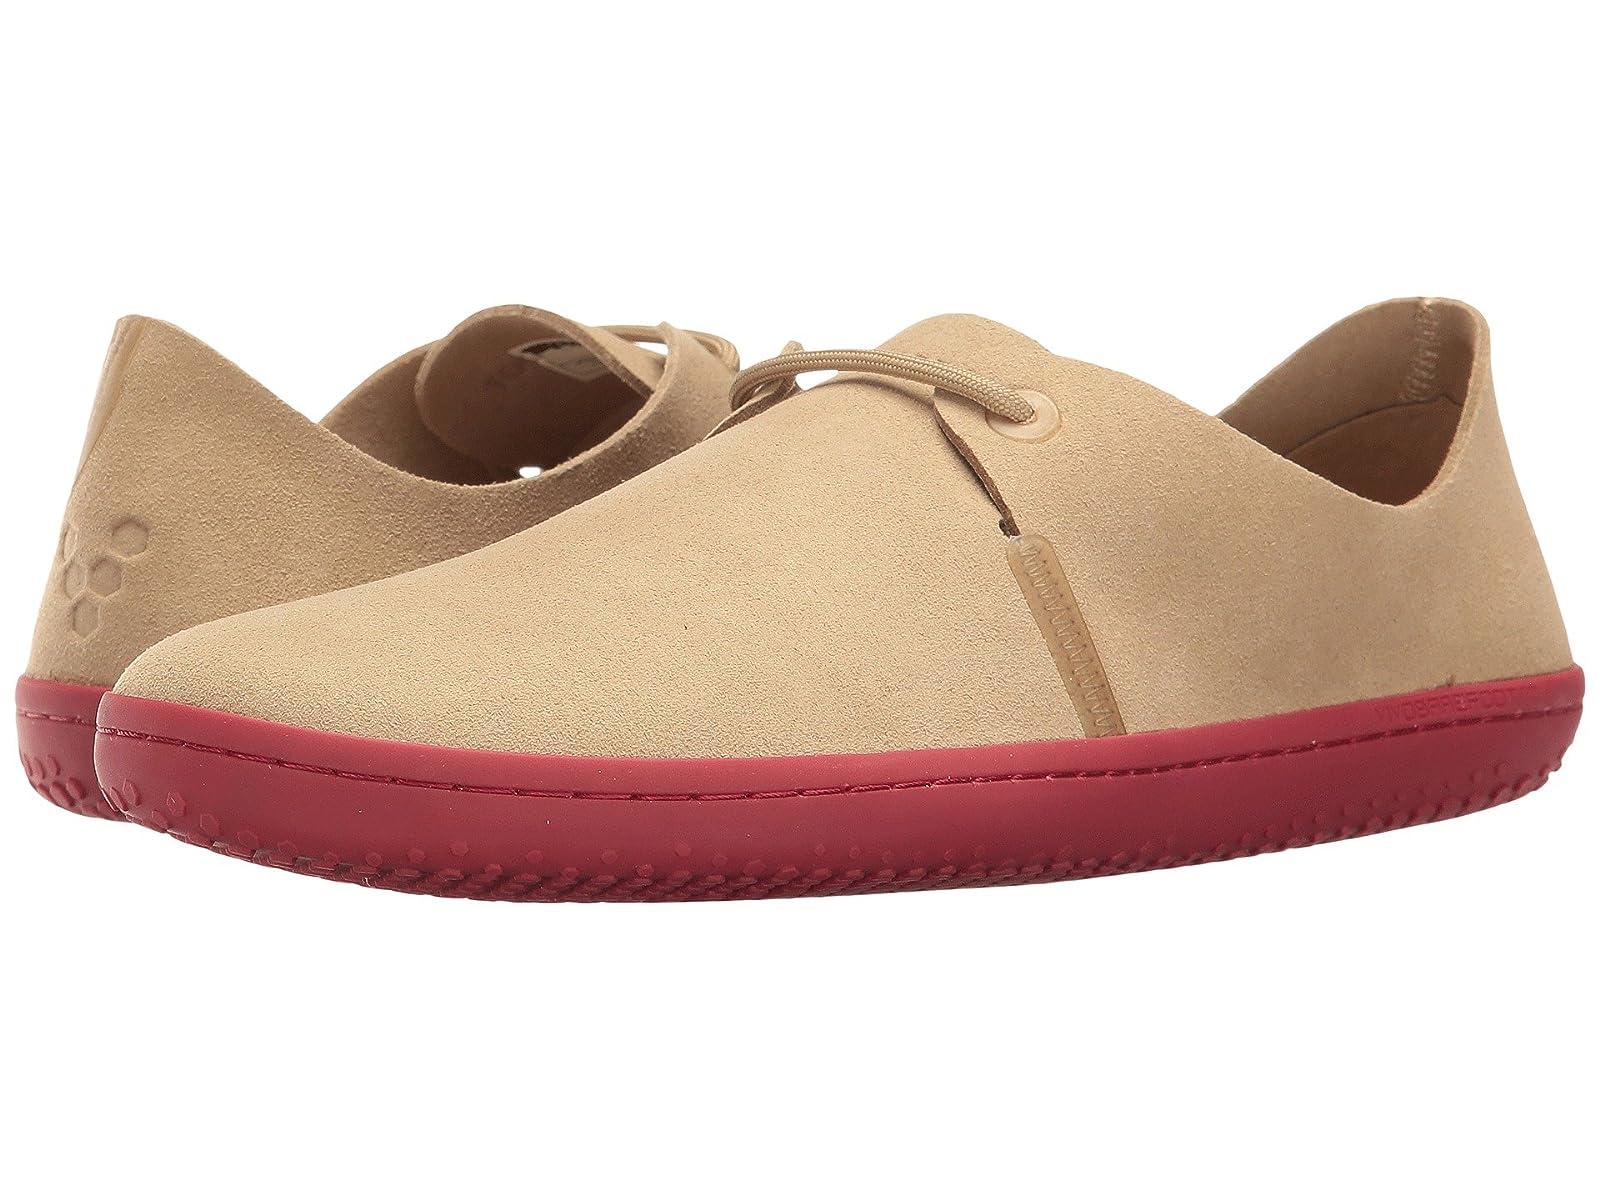 Vivobarefoot Rif EcoAtmospheric grades have affordable shoes